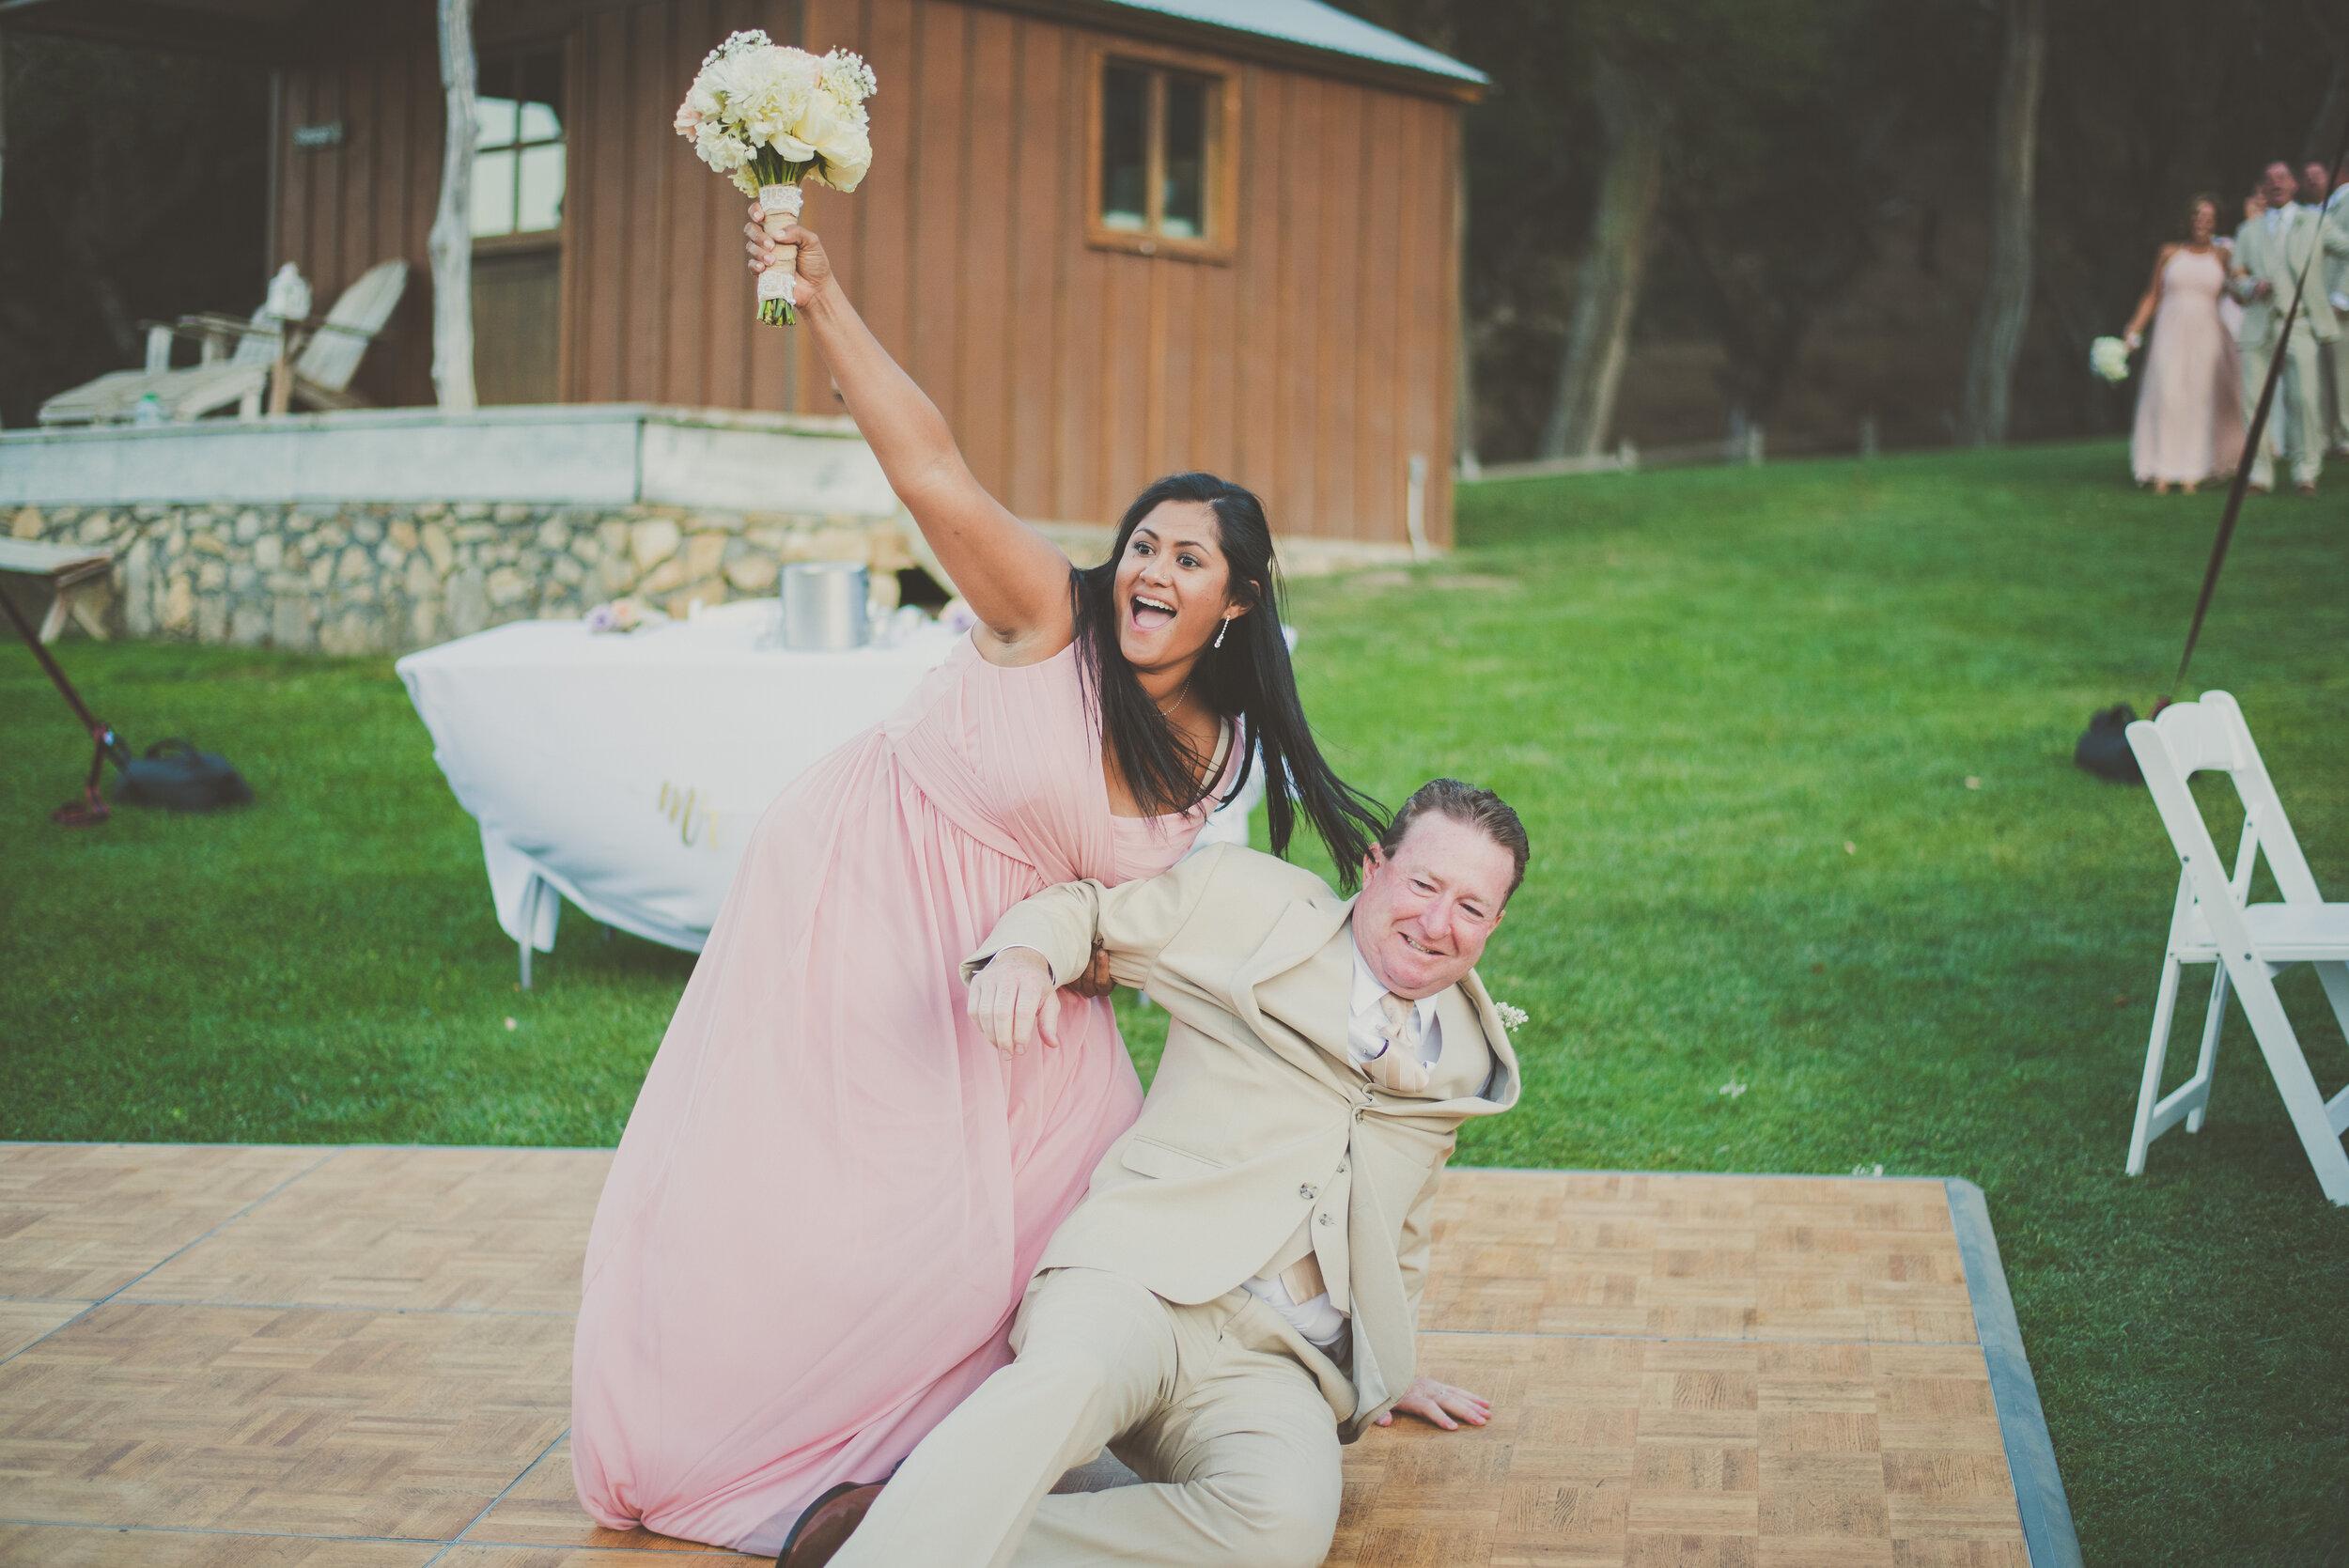 Roberts Wedding - Reception-31.jpg